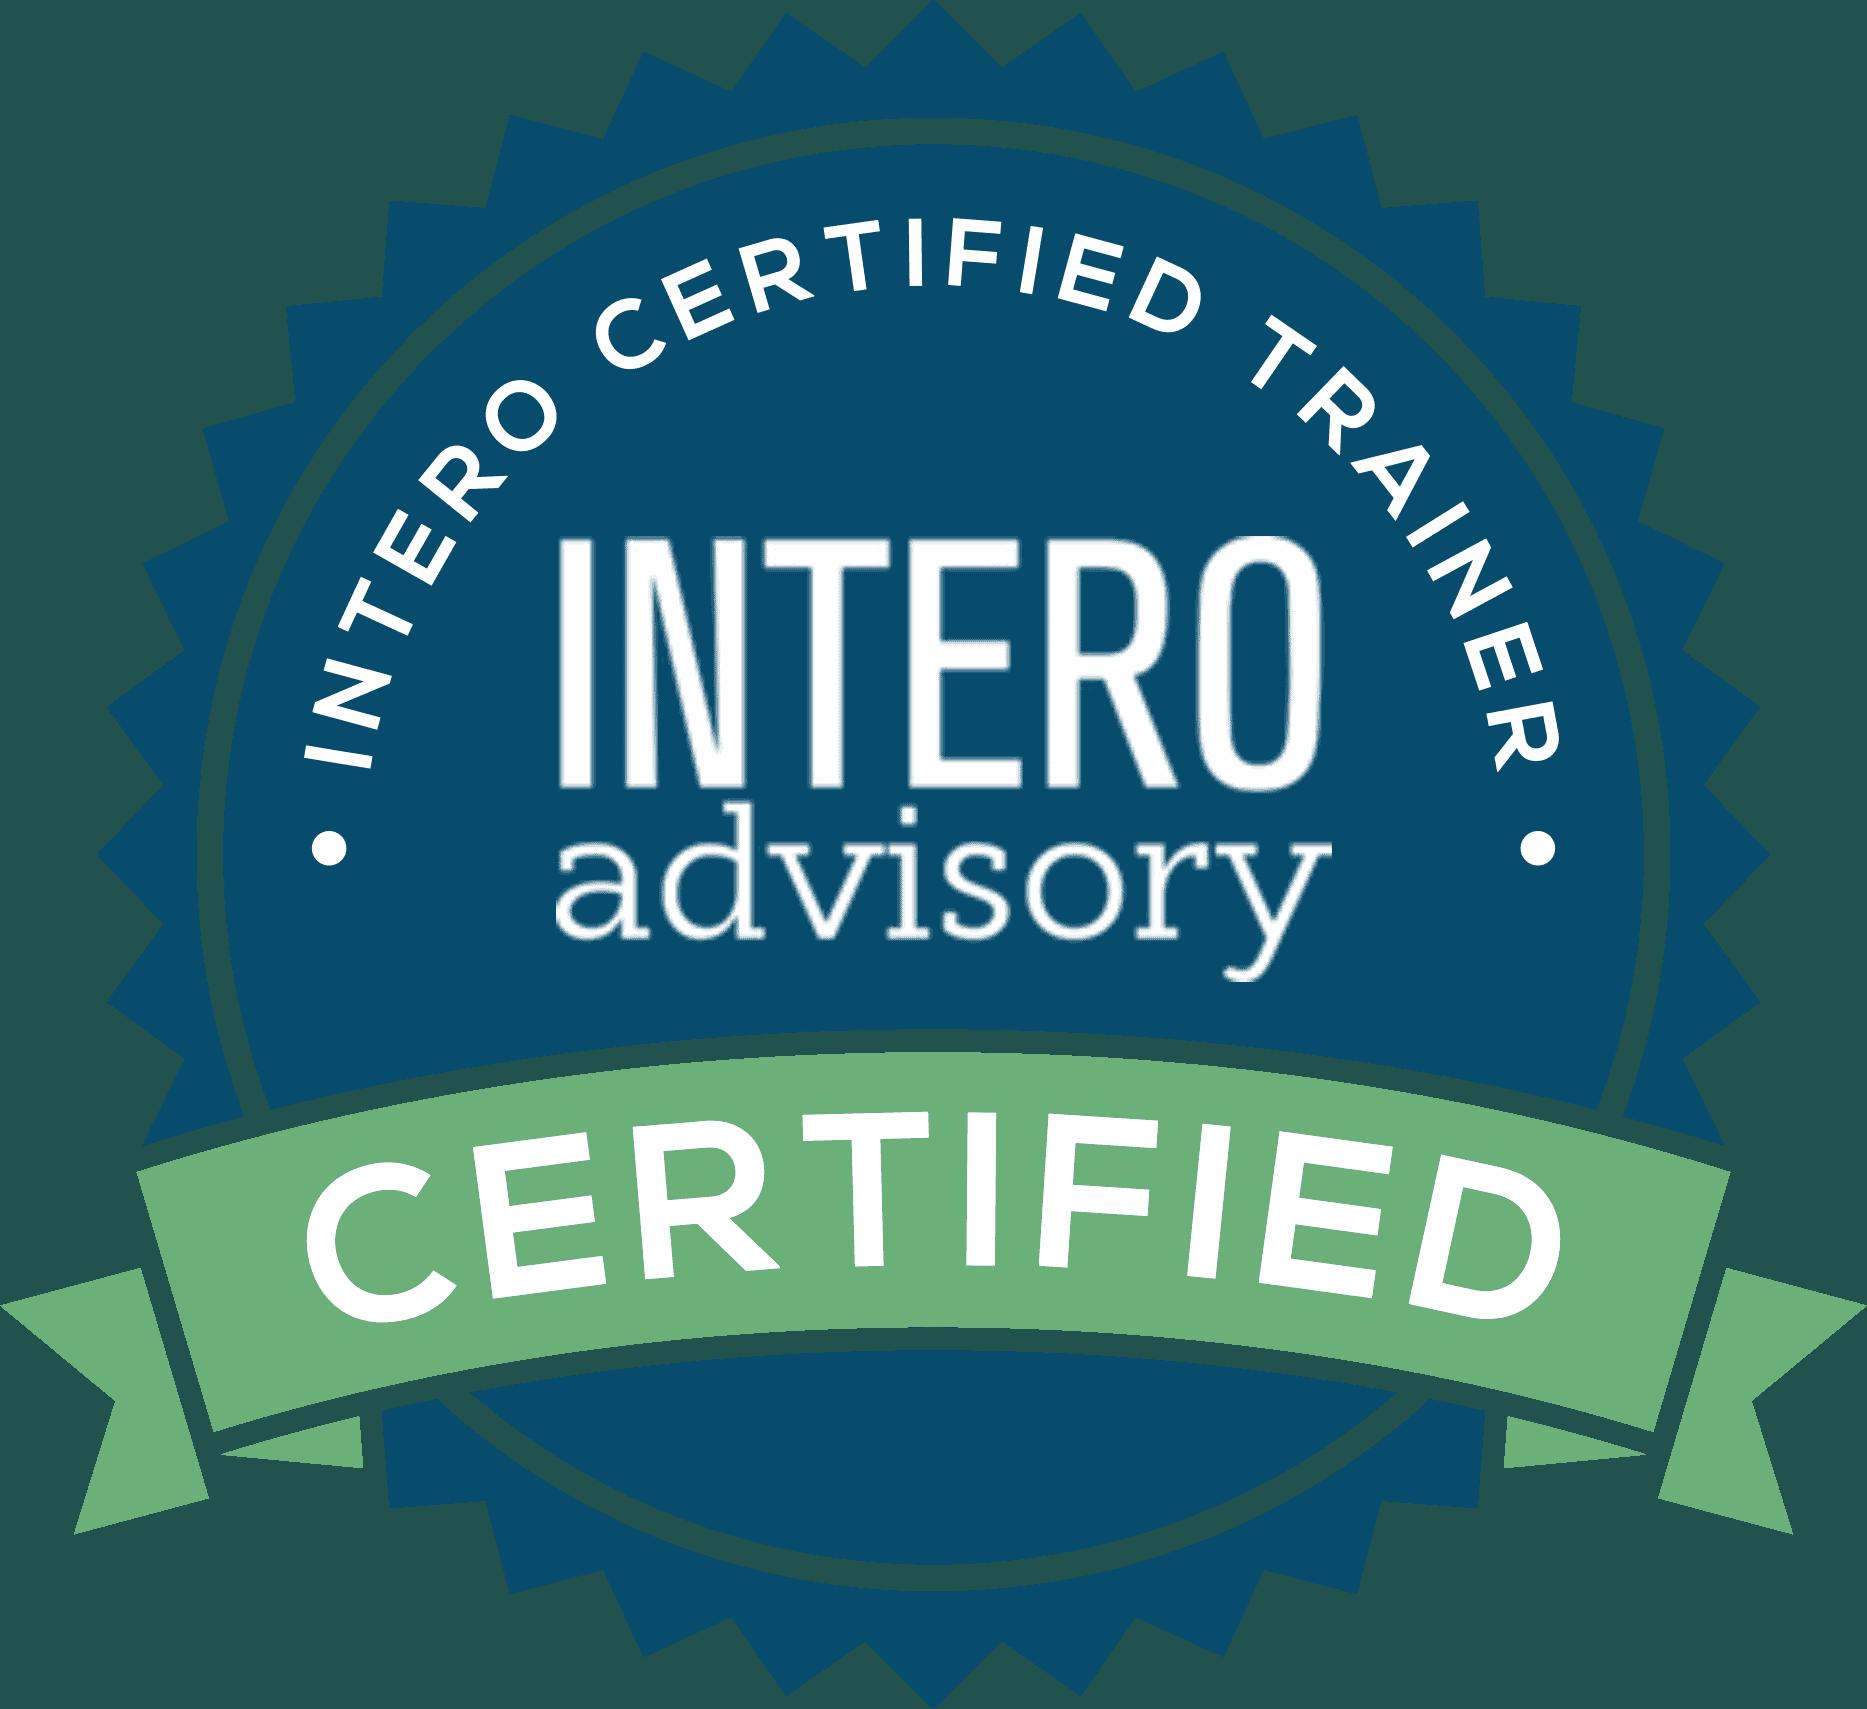 Intero Advisory Certified Training Badge